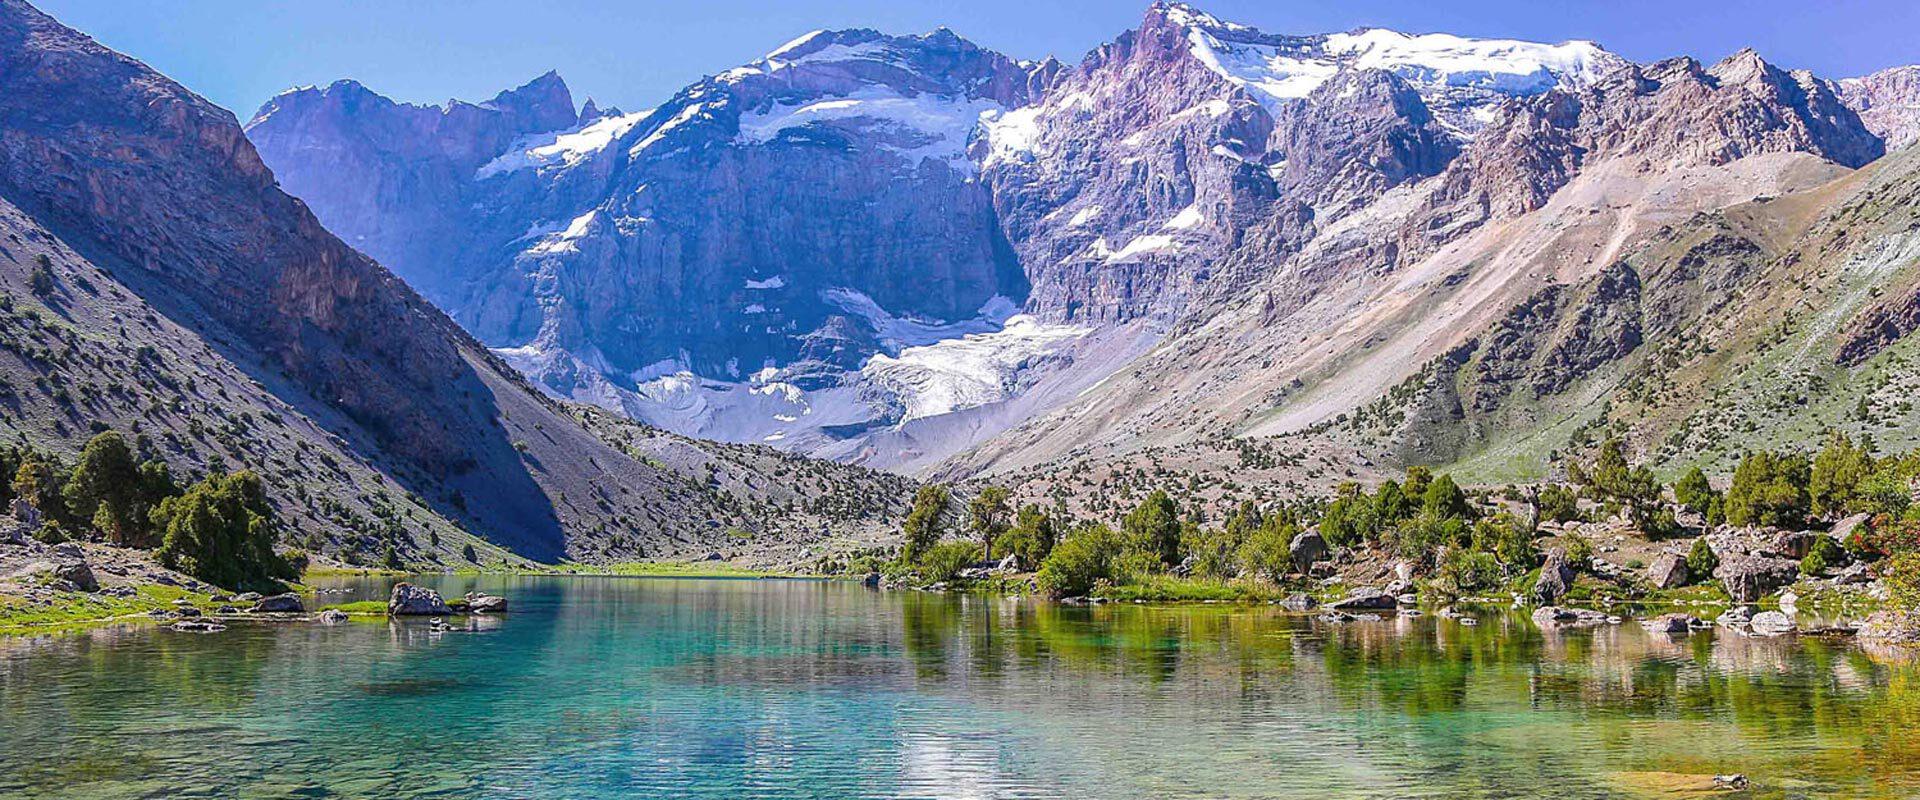 Fascinants Mondes Montagneux du Tadjikistan